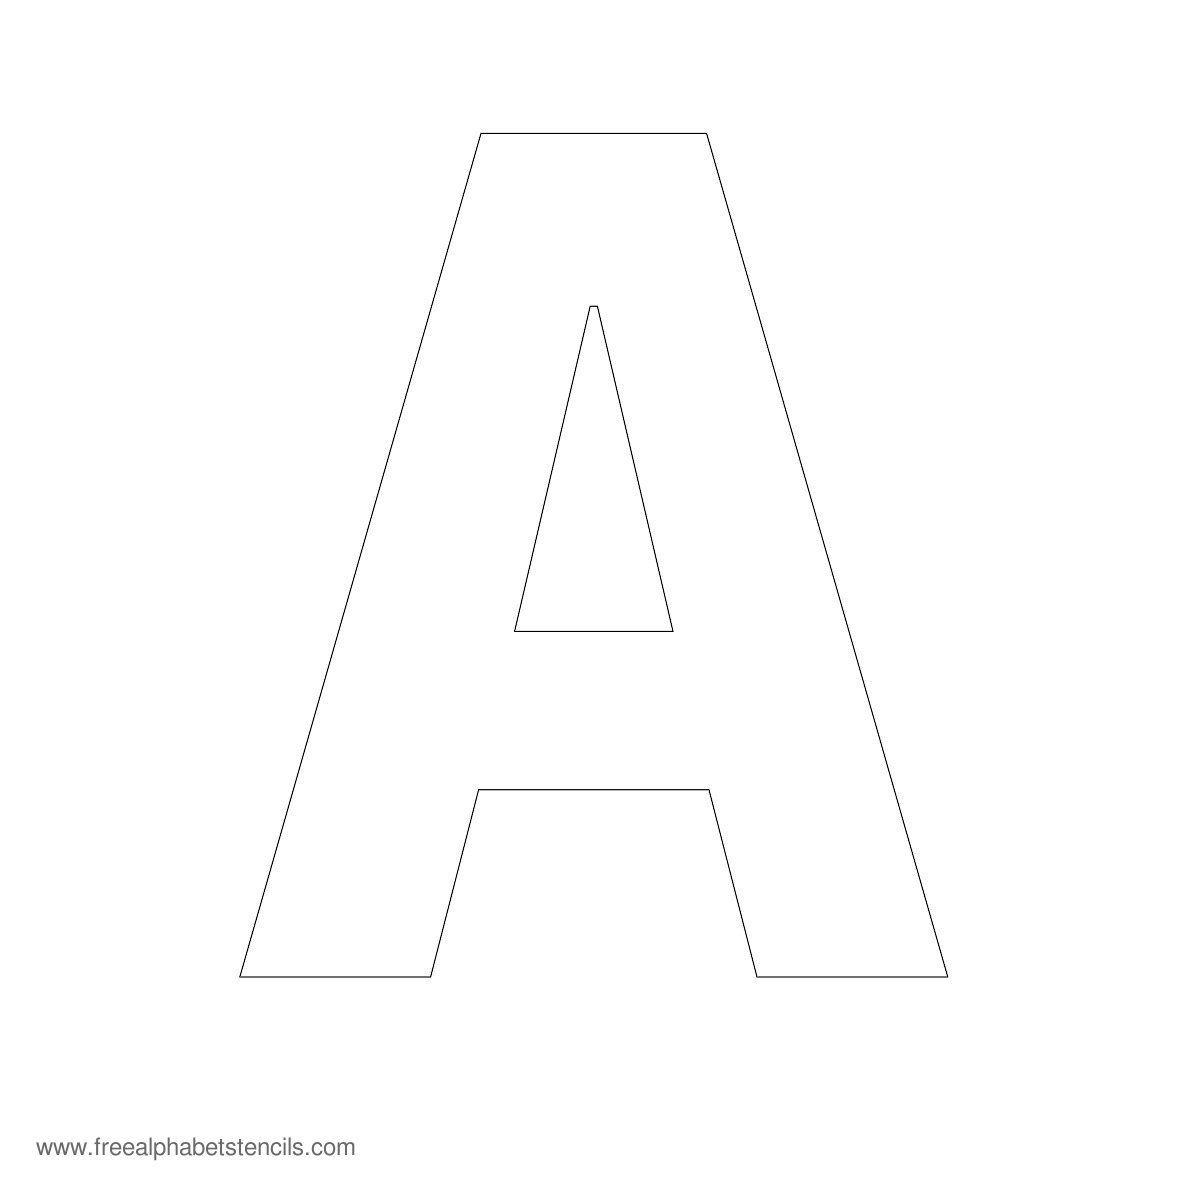 Free Printable Fancy Letters   Free Printable Large Alphabet Letter - Free Printable 8 Inch Letters